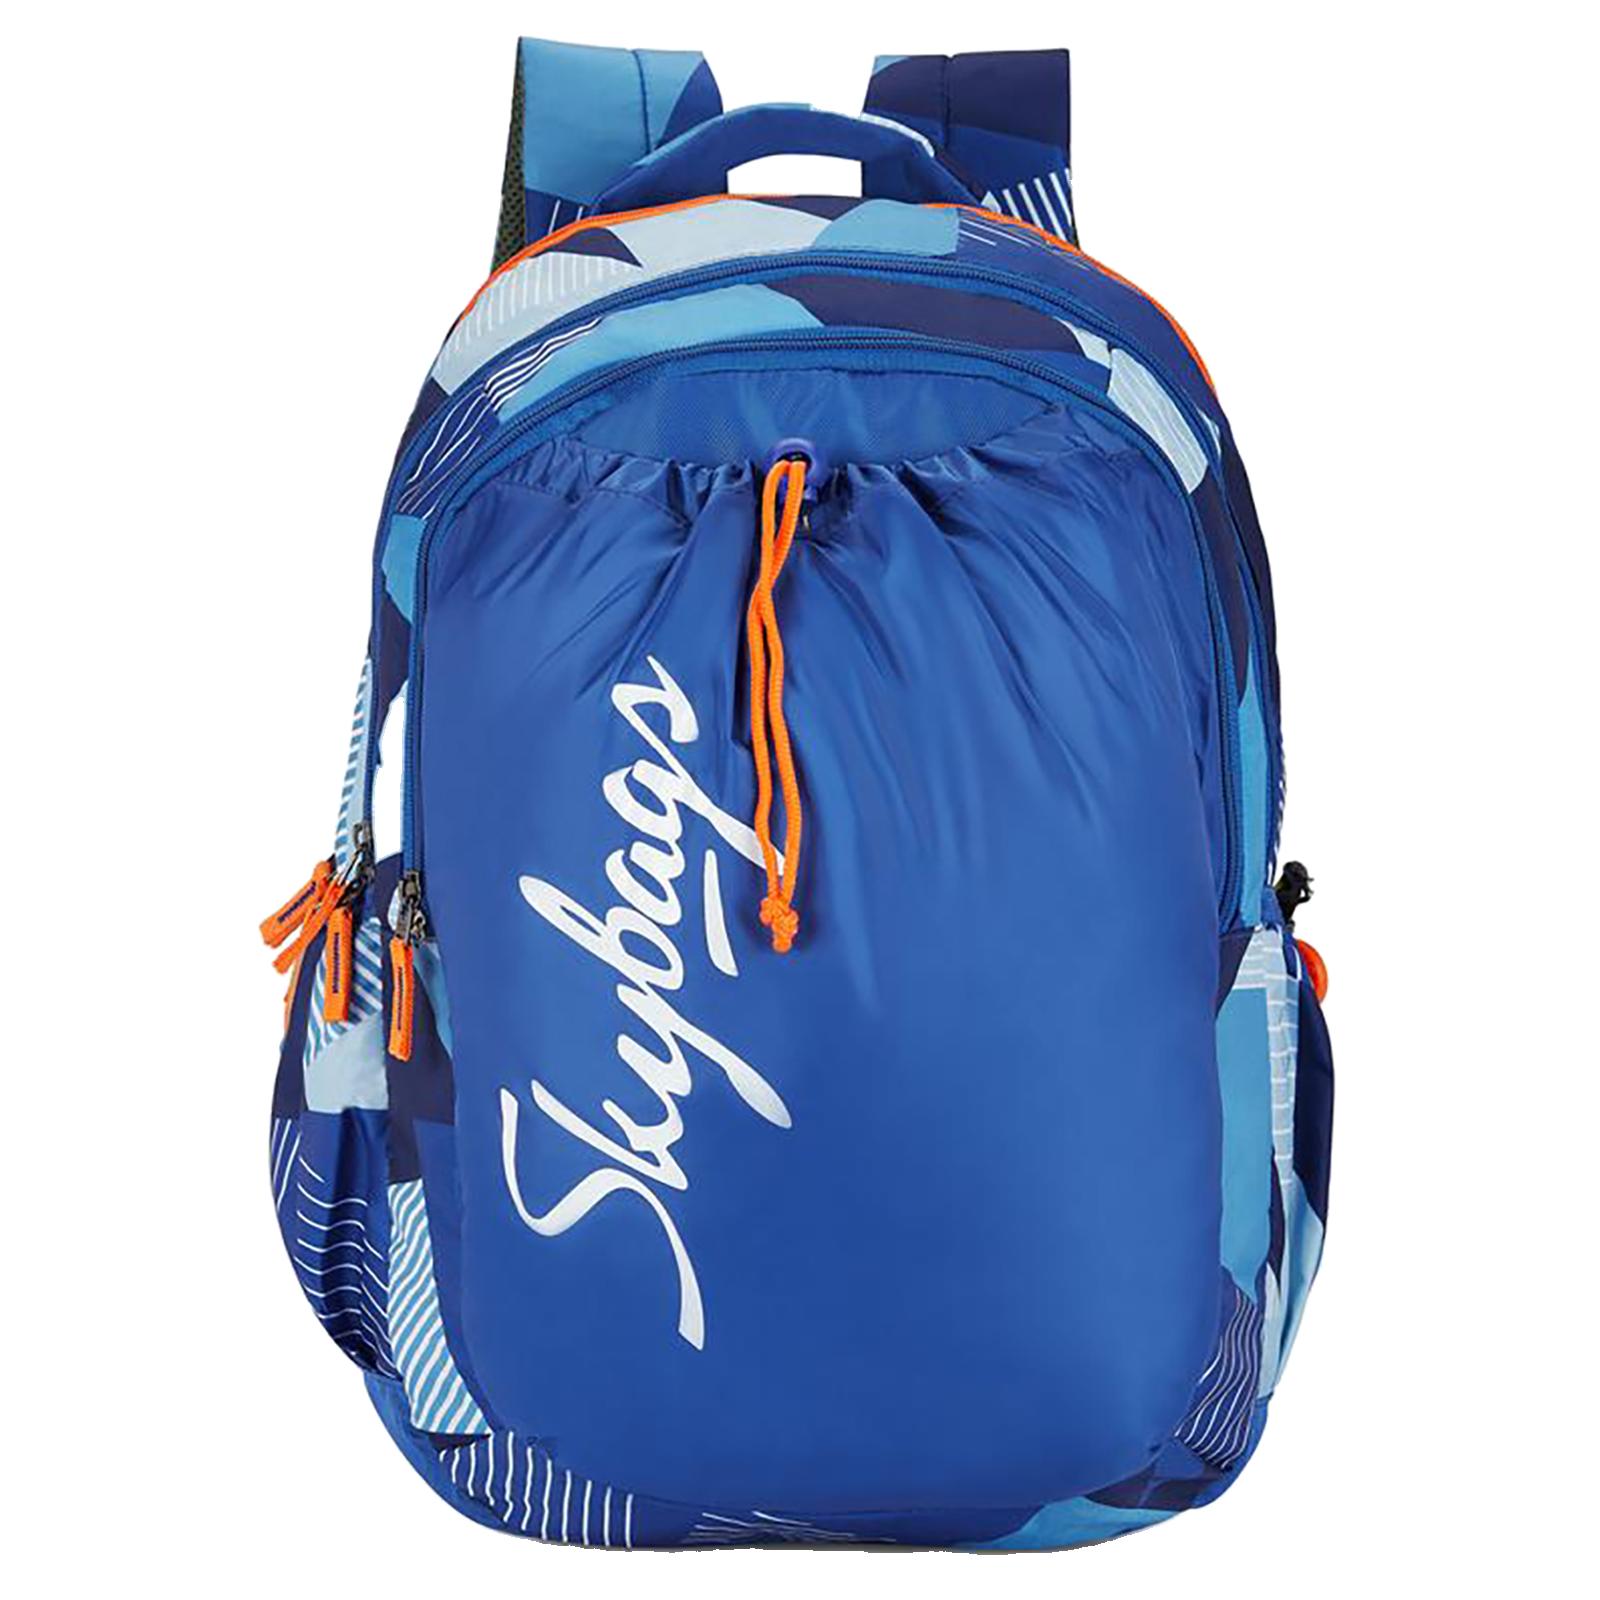 Sky Bags Astro Nxt 10 34 Litres Mini Gucci Backpack (Rain Cover, BPASN10BLU, Blue)_1